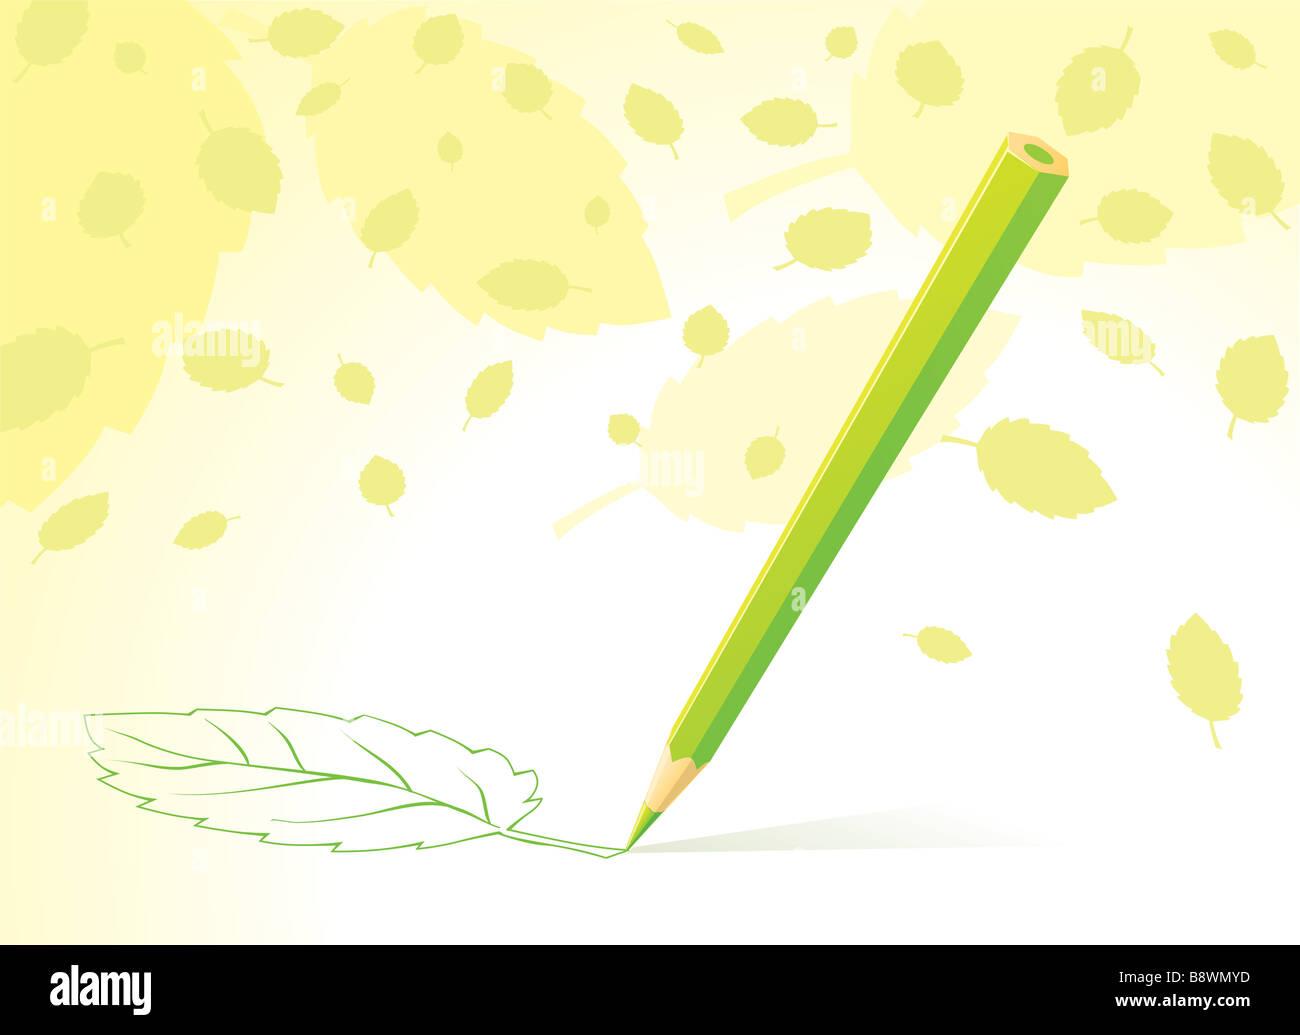 Ilustración de la pluma verde de la hoja de dibujo Imagen De Stock